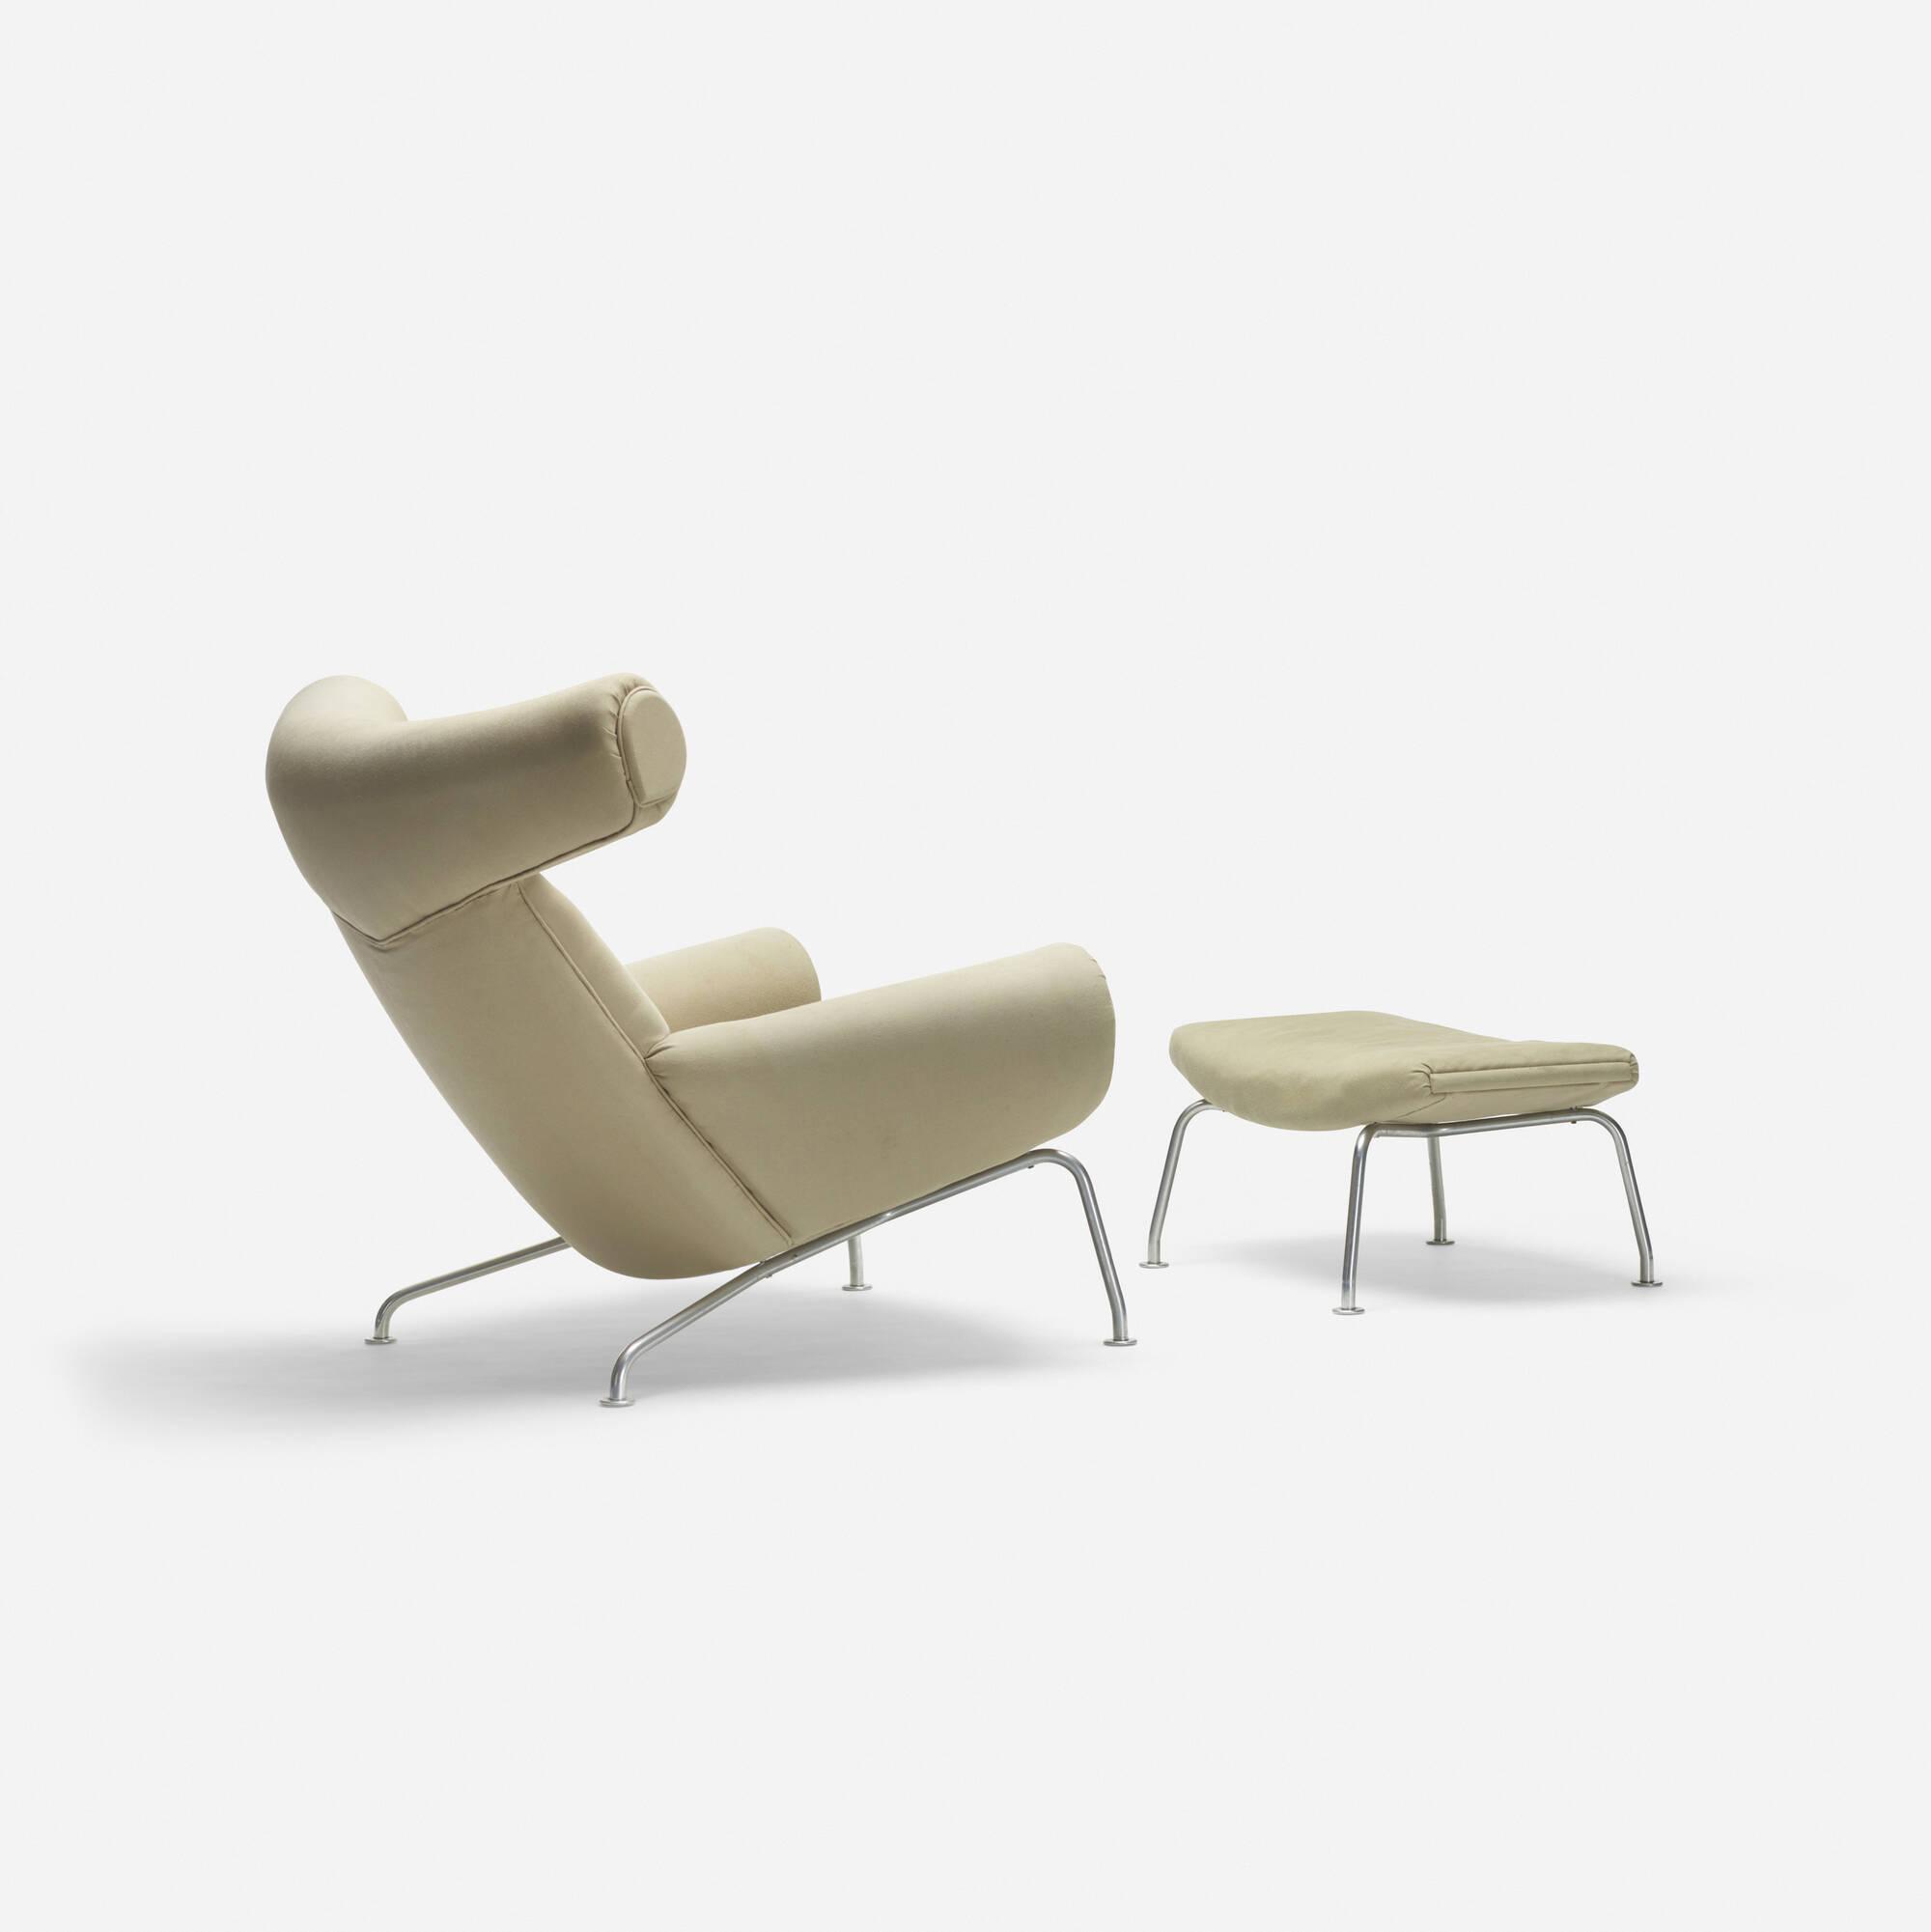 156: Hans J. Wegner / Ox chair and ottoman (2 of 4)